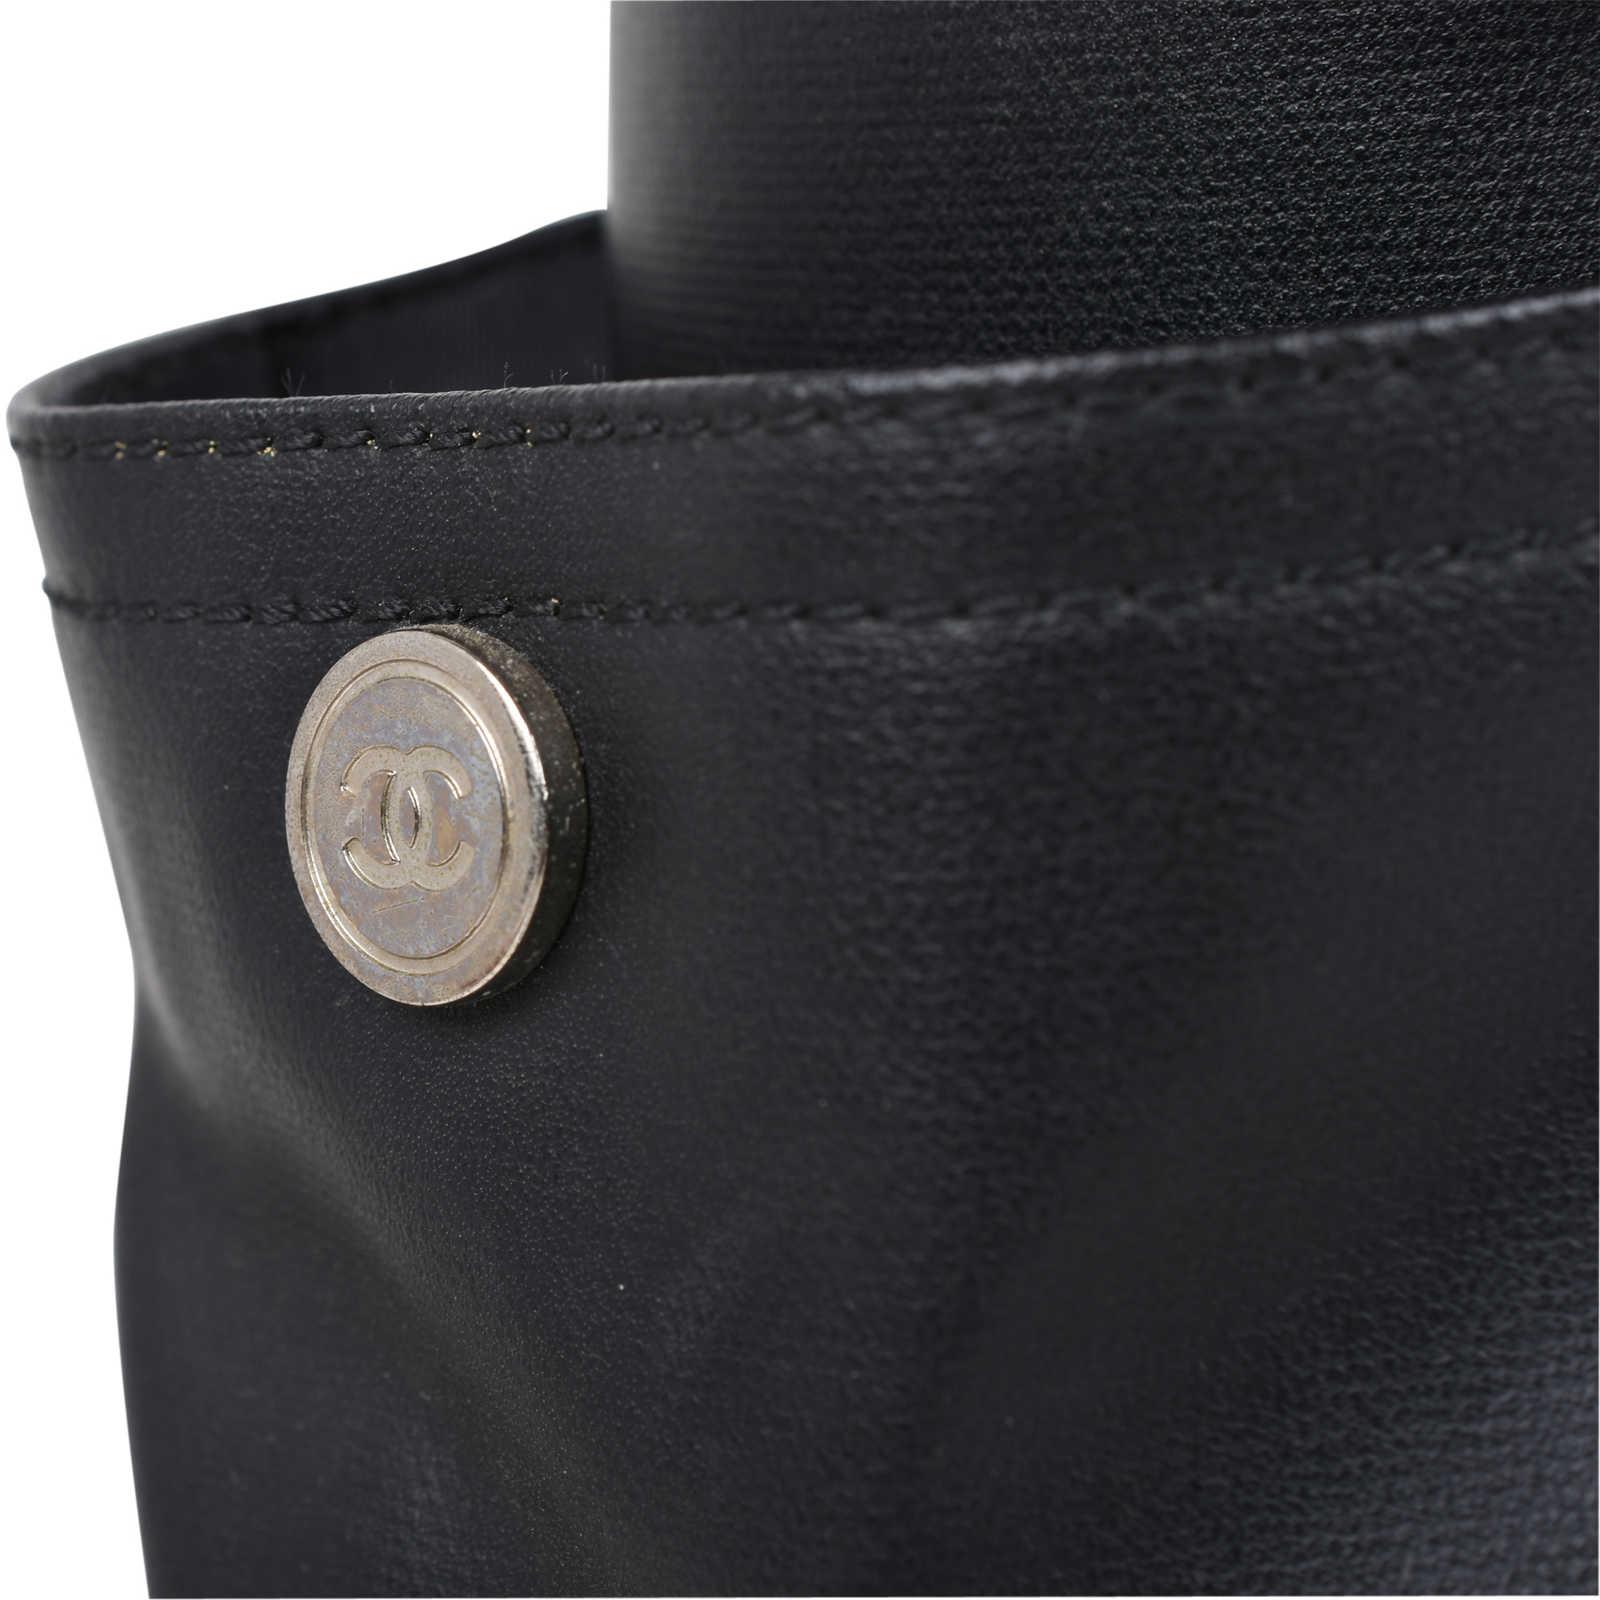 67dbf02bfa66 ... Authentic Second Hand Chanel Paris Biarritz Tote Bag (PSS-523-00002) ...